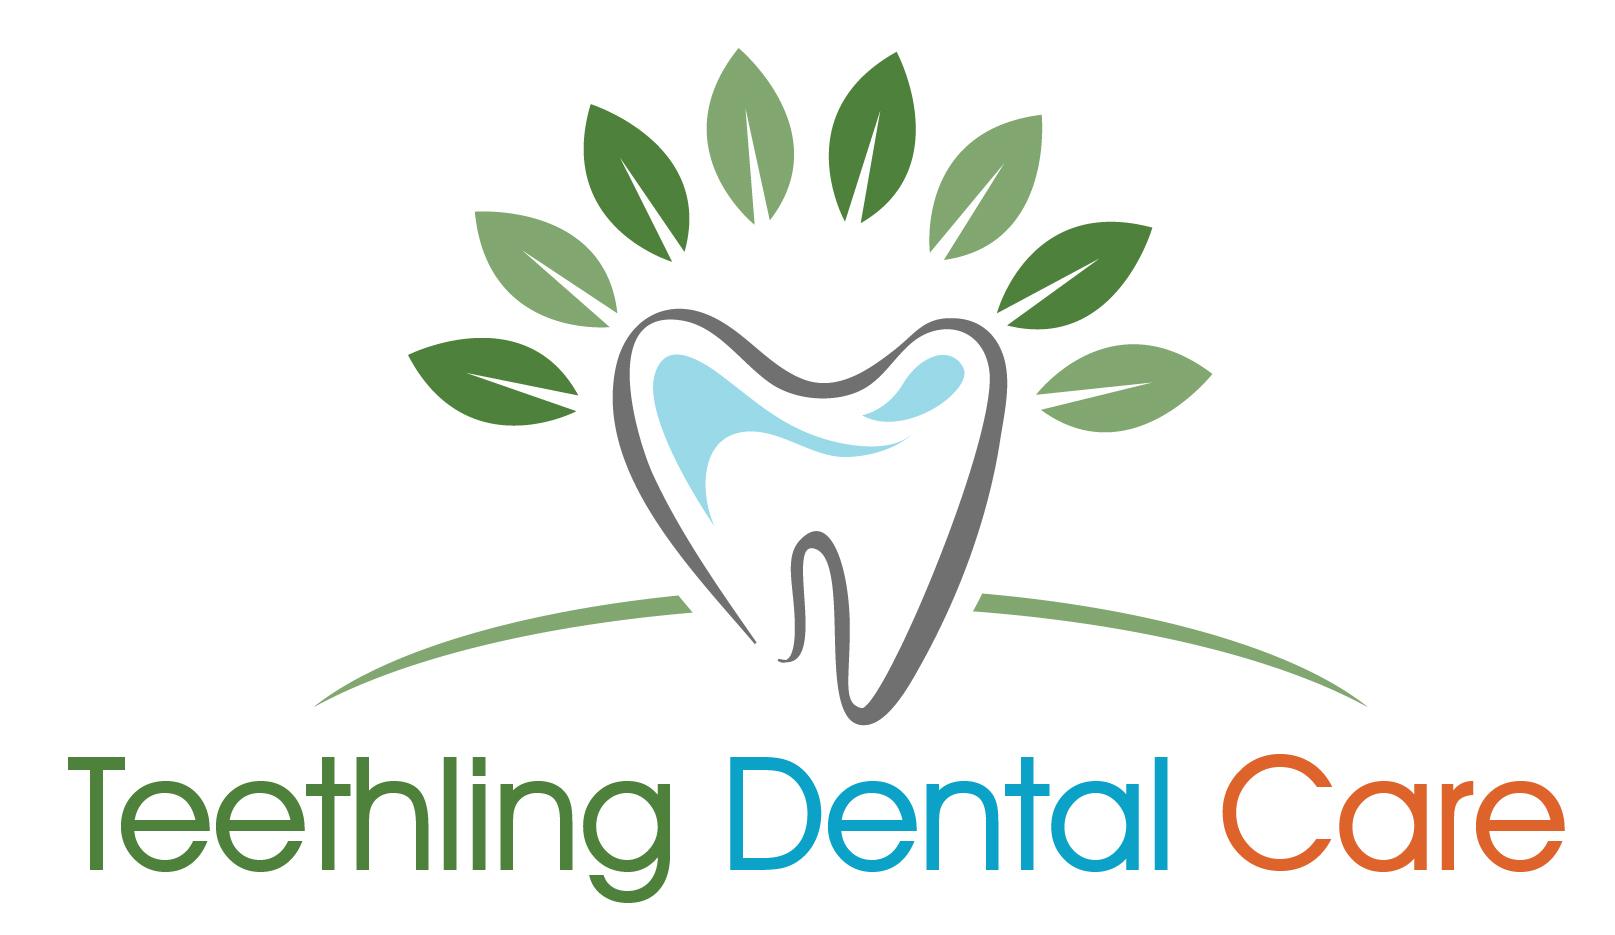 Teethling Dental Care